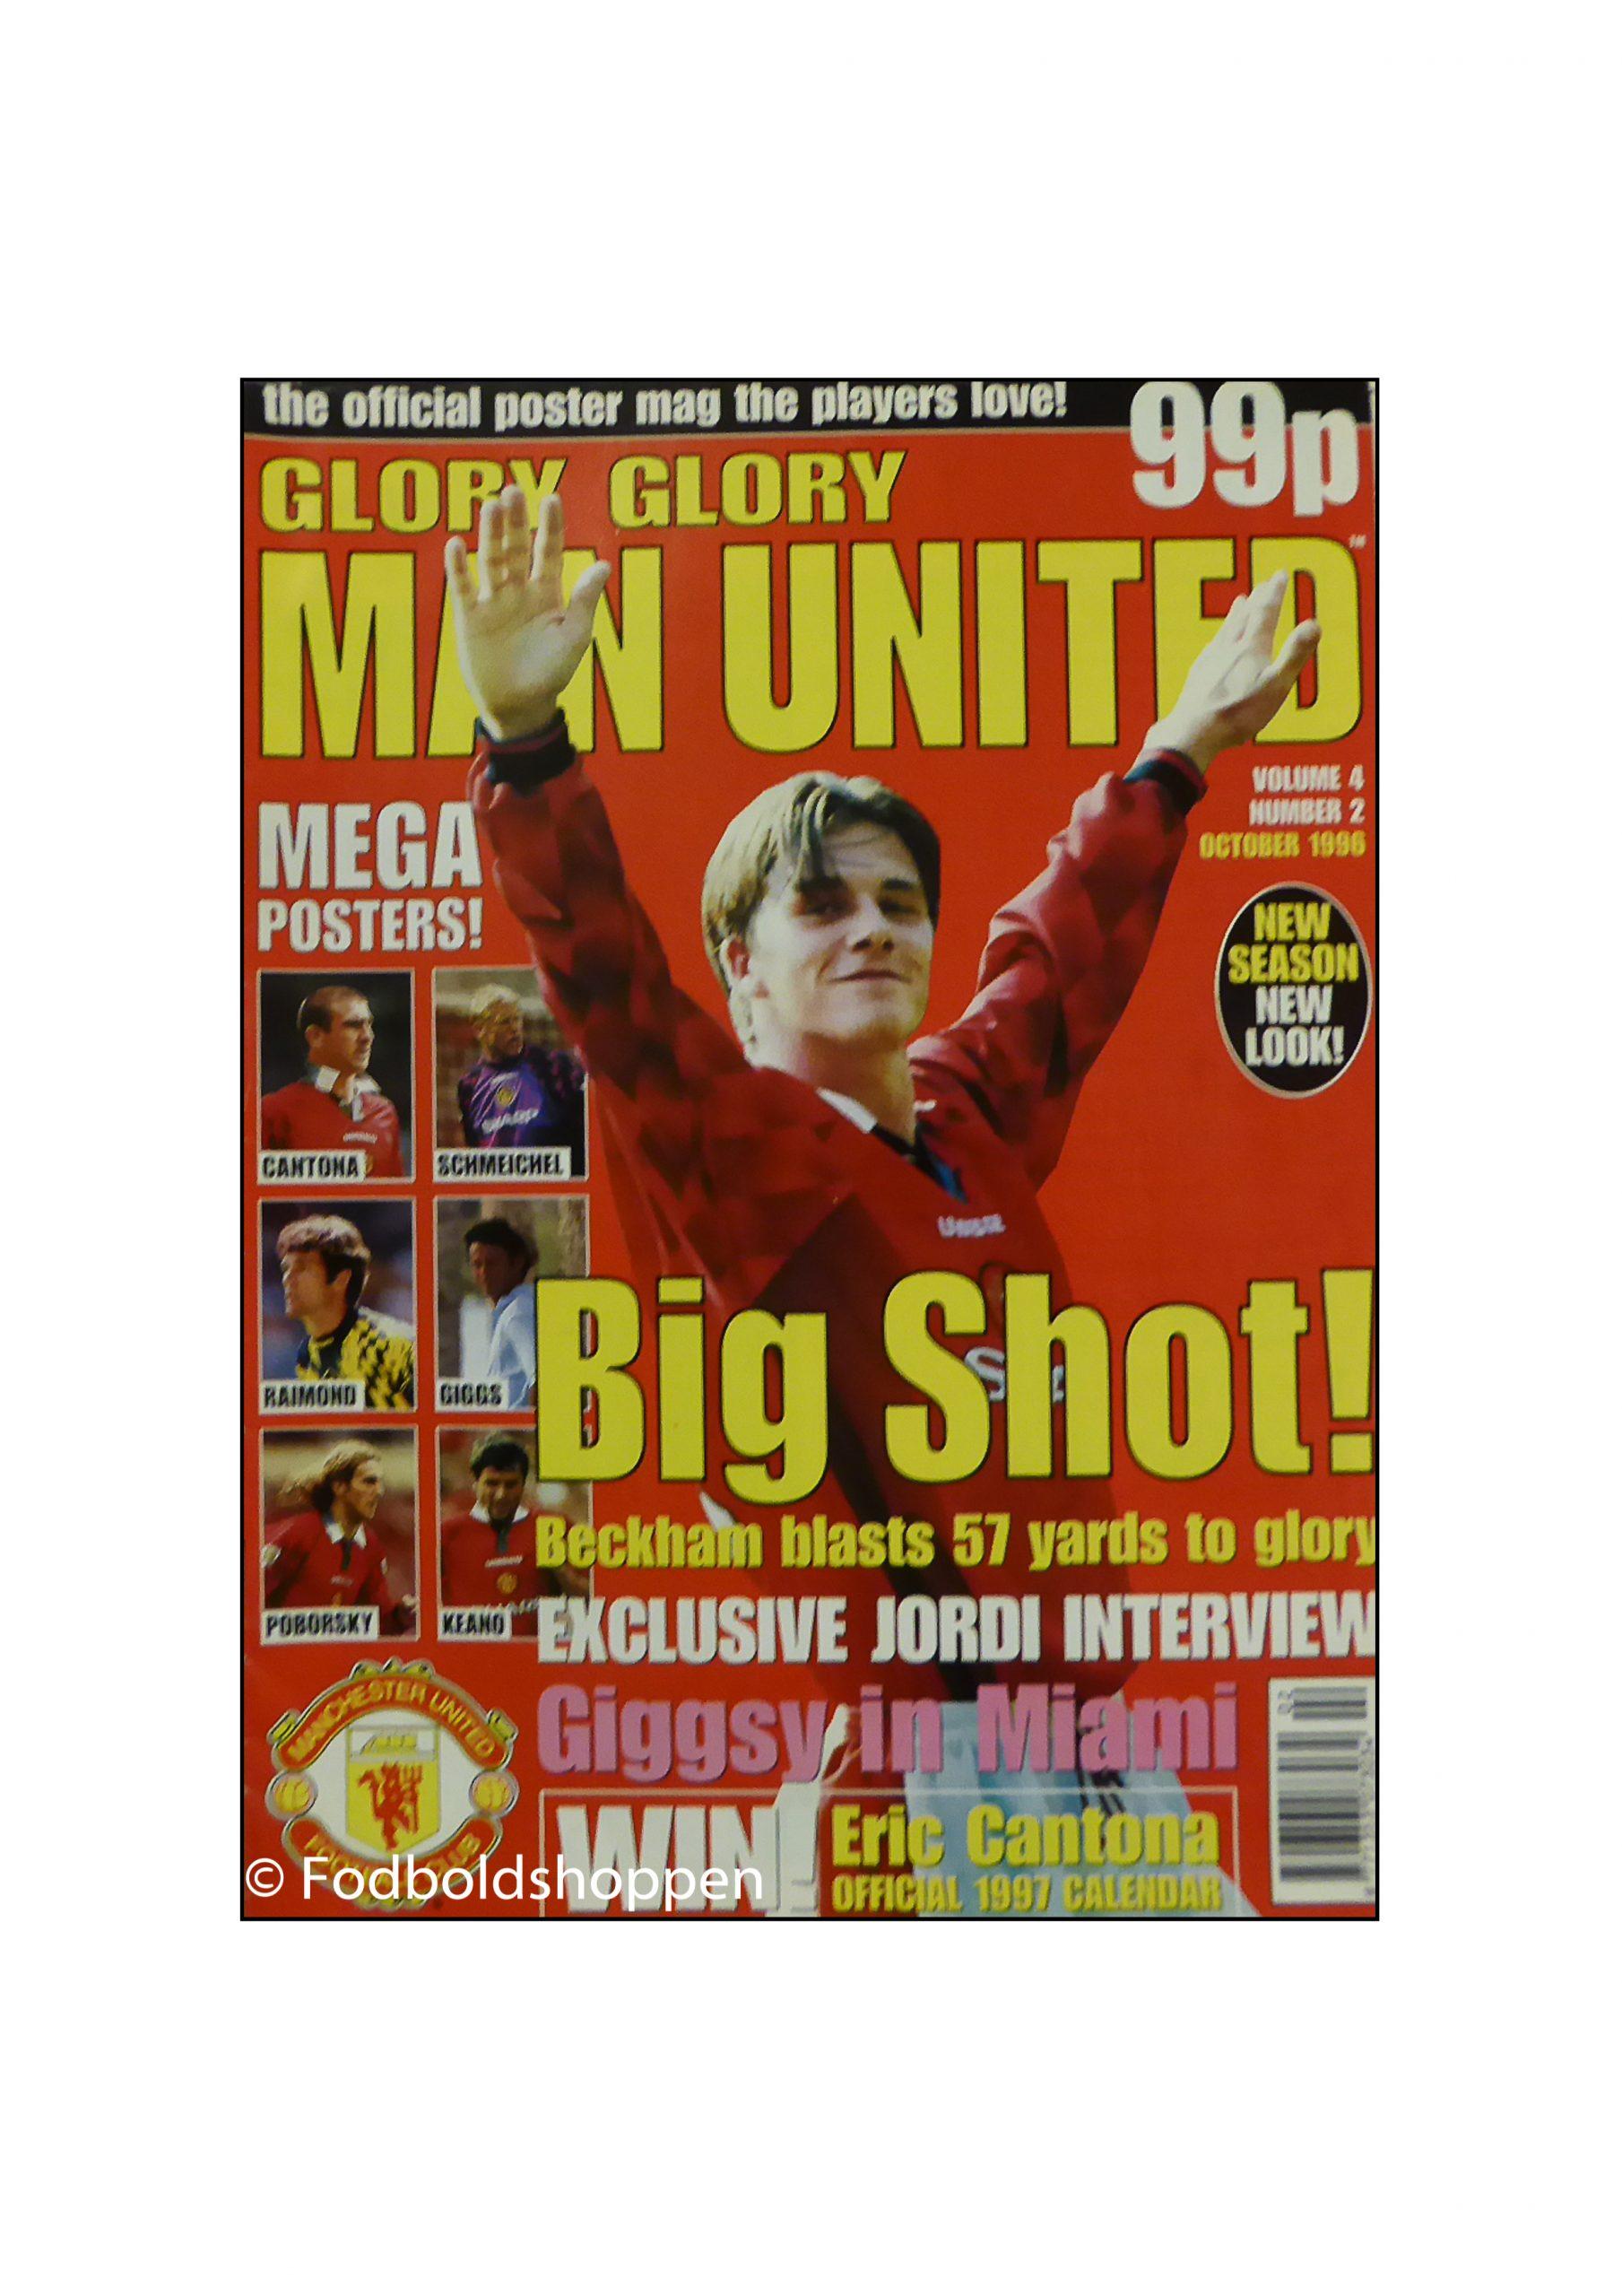 Glory Glory Man United . Volume 4, Number 2